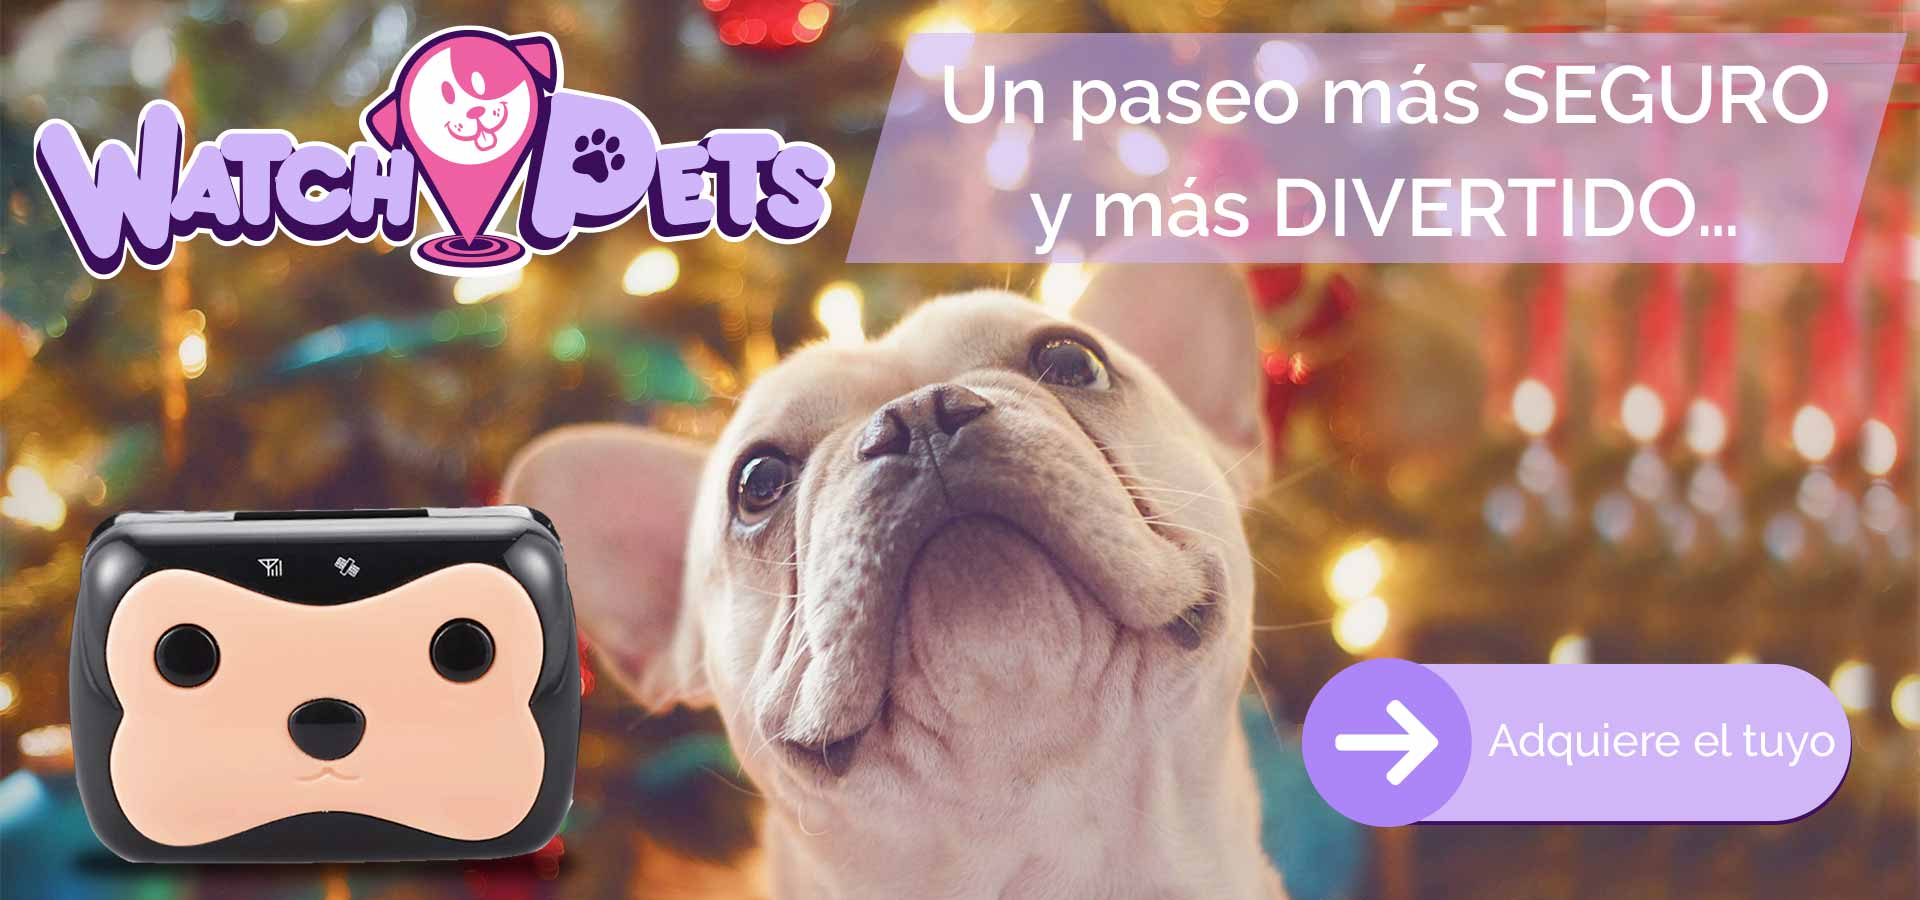 wathckids-pets-unpaseomasdivertido-V2